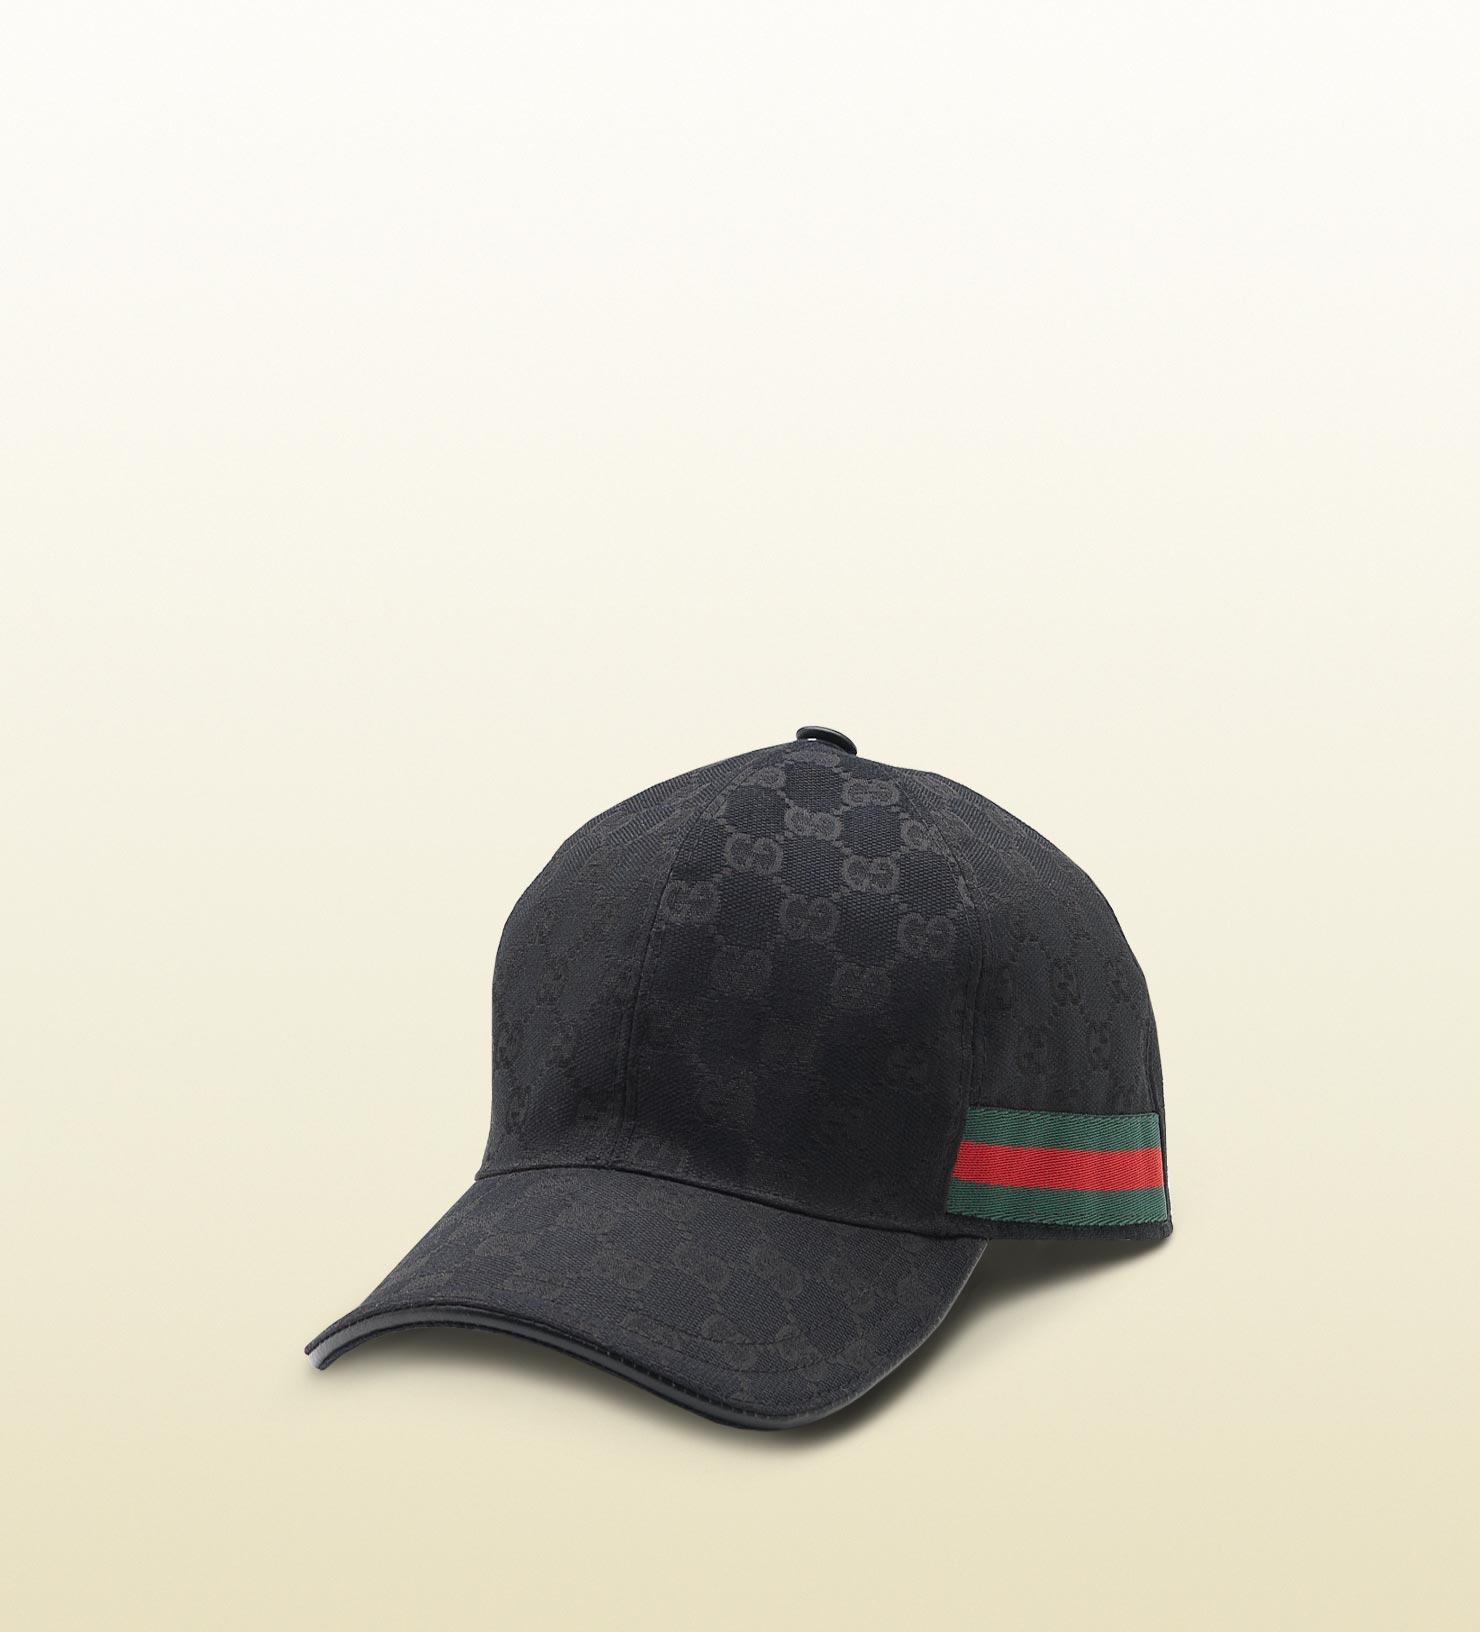 gucci original gg canvas baseball hat with web in black